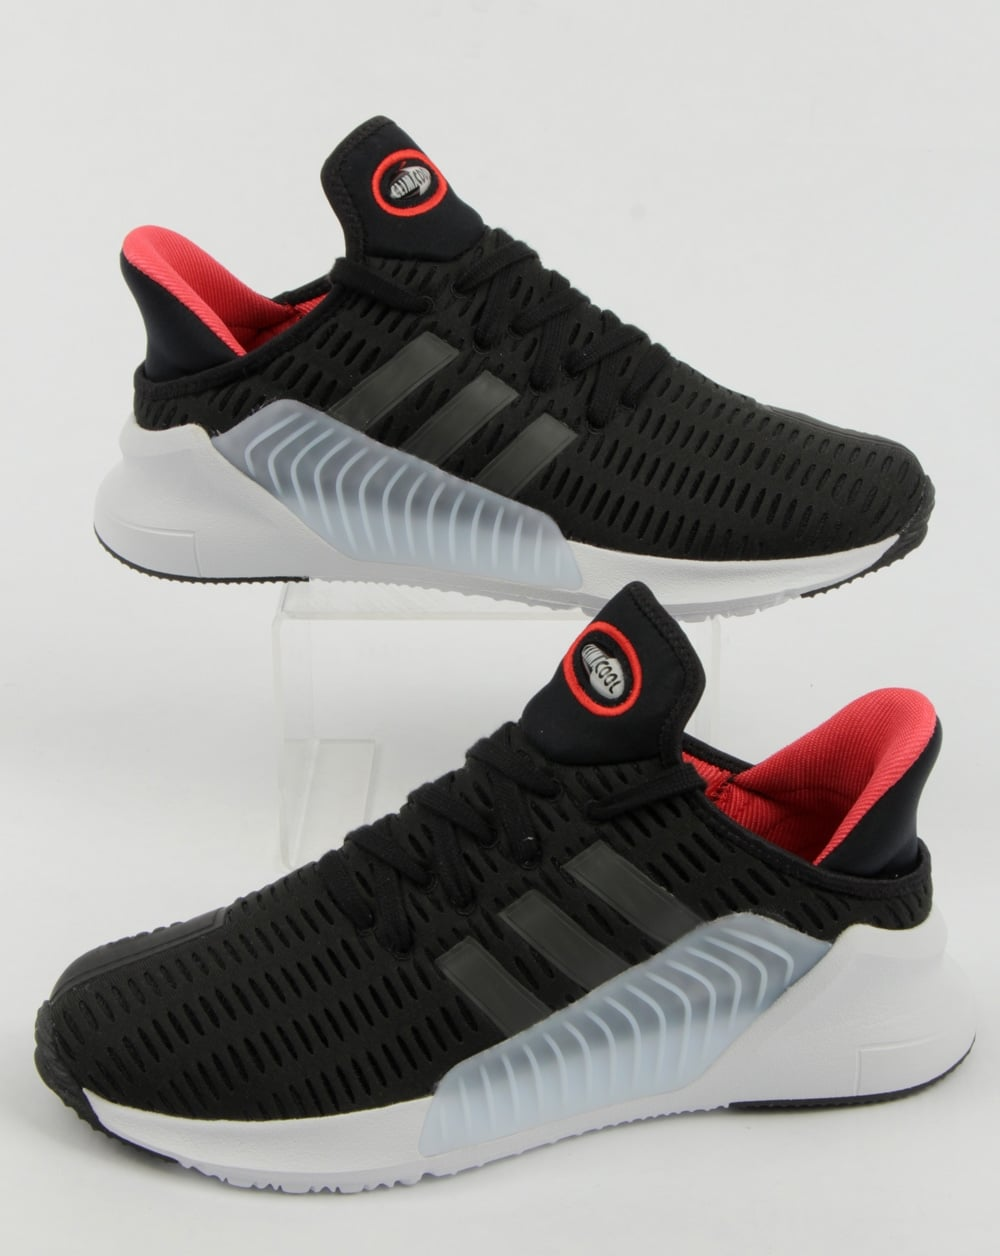 habilidad labios Sabroso  Adidas Climacool 02/17 Trainers Black/white, Trainers, Mens, Original